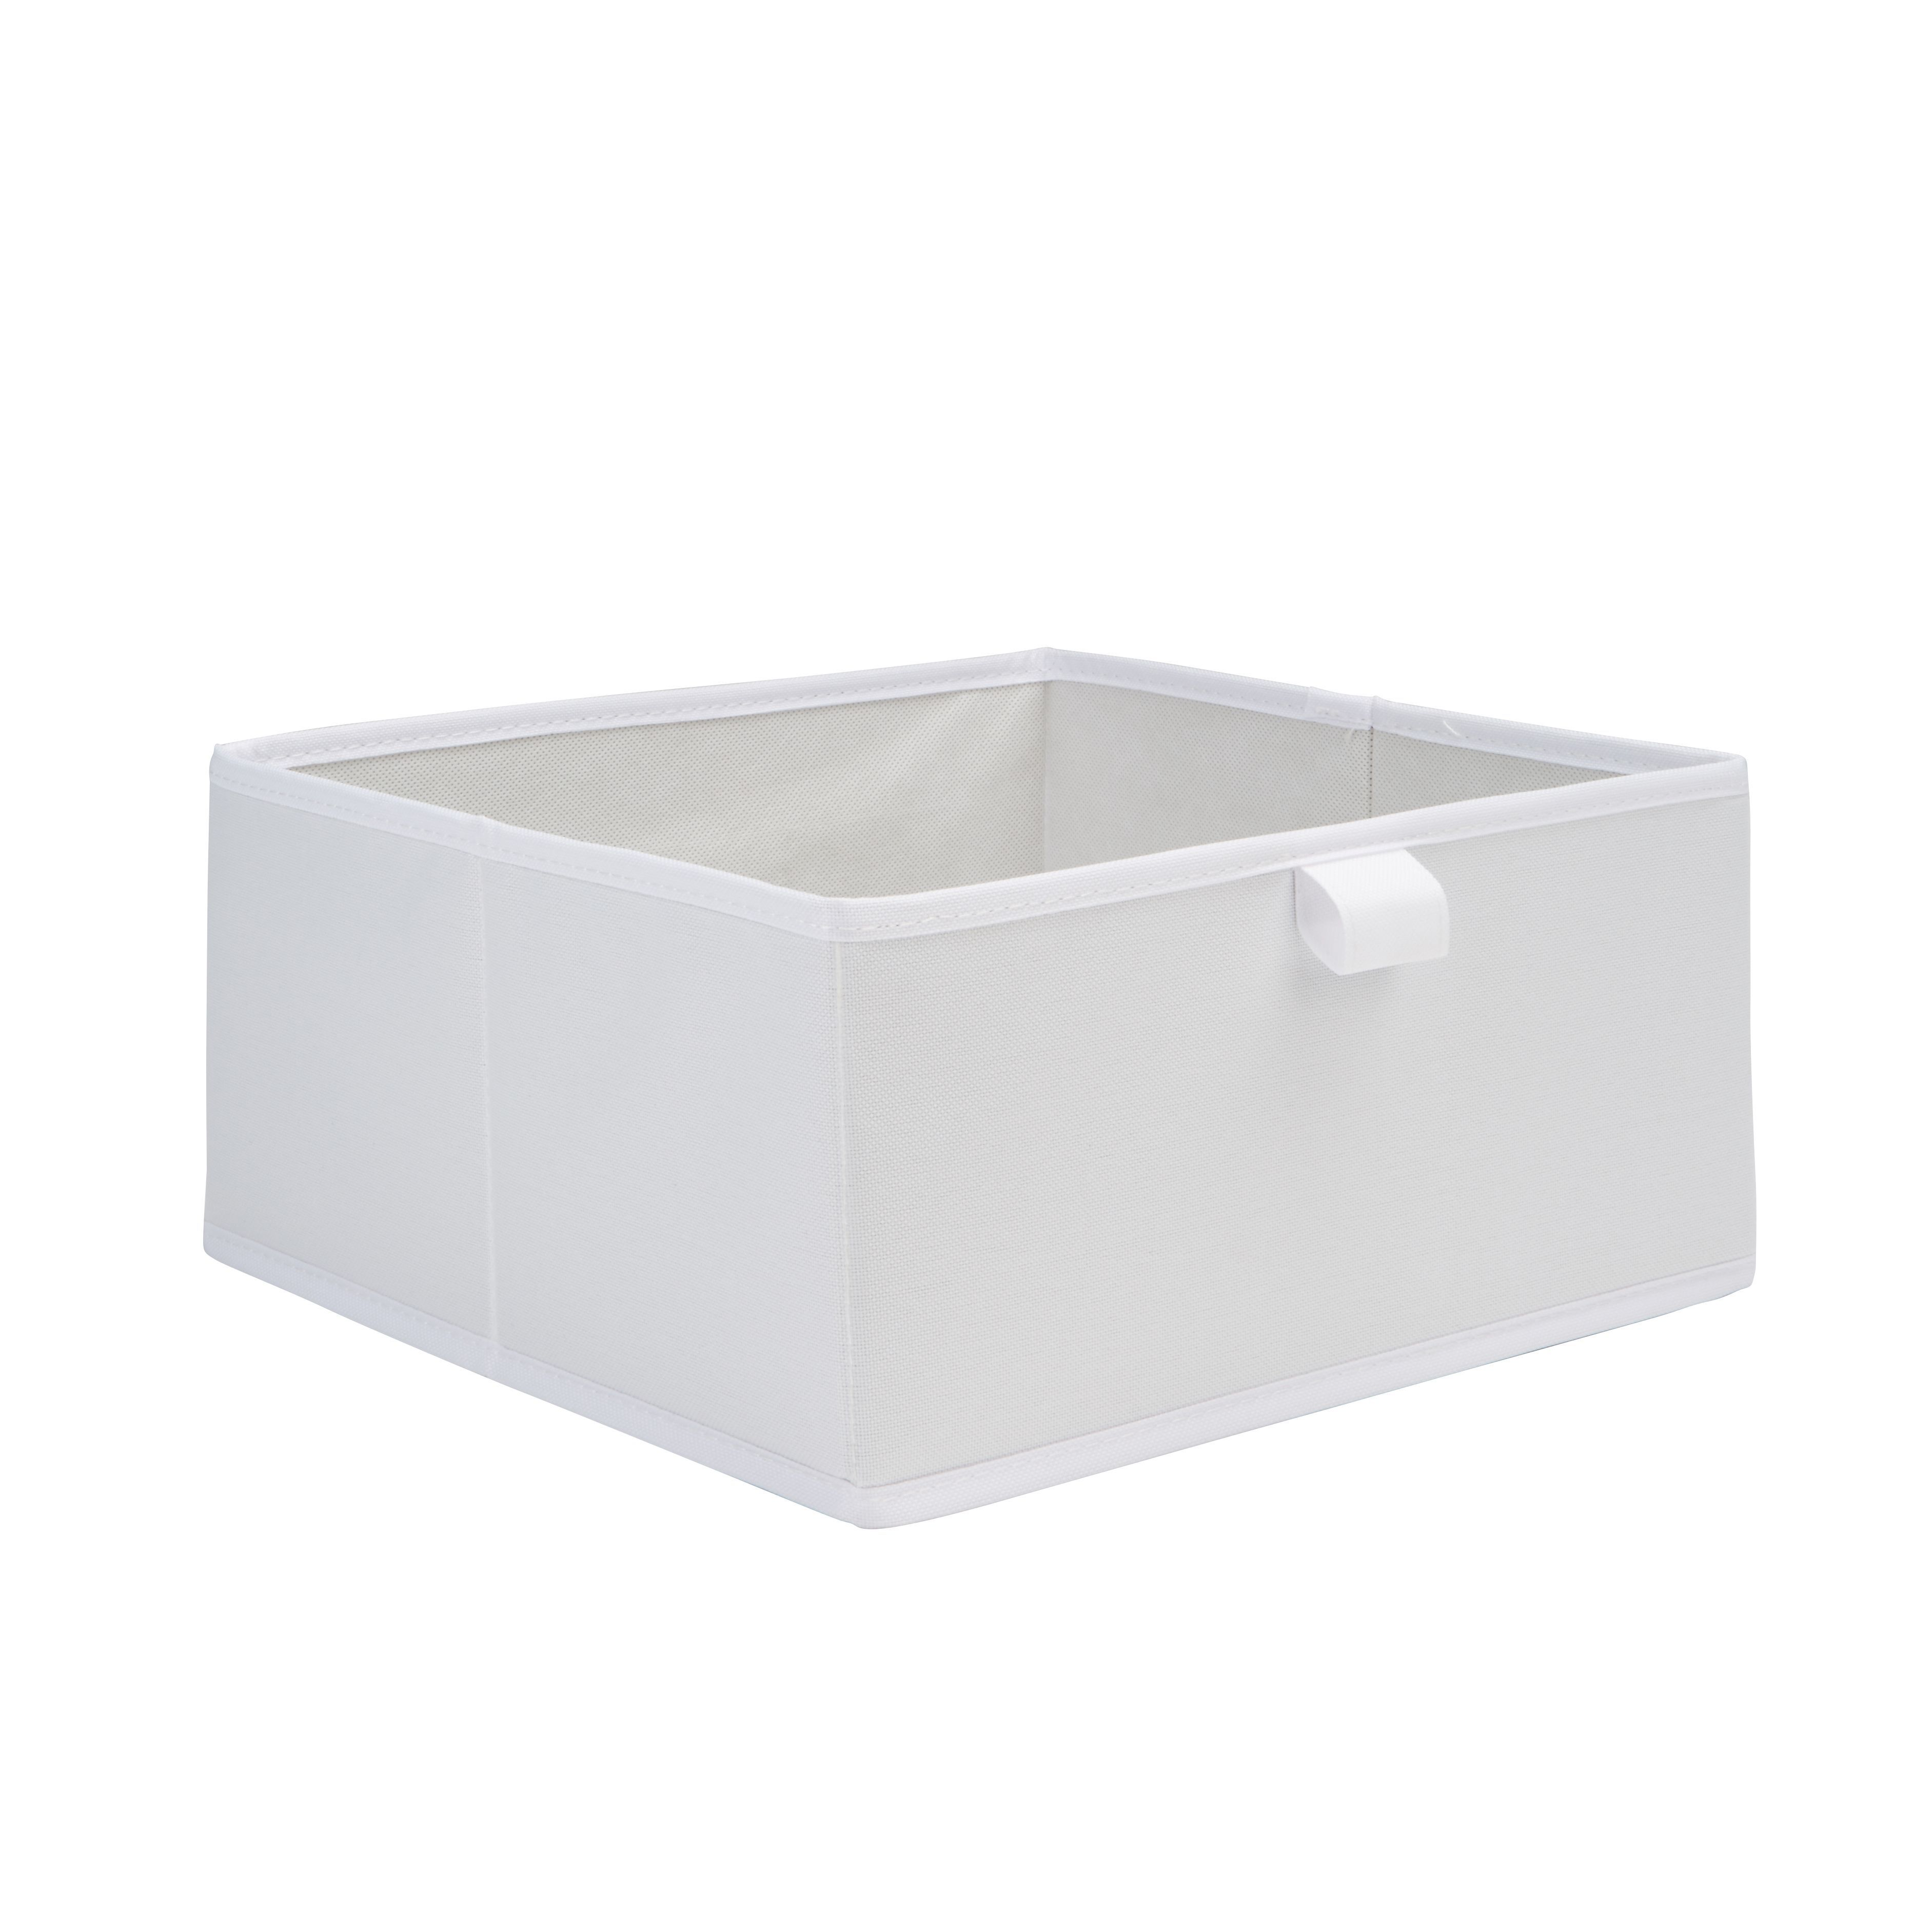 Form Mixxit White Half Height Storage Box (w)310mm